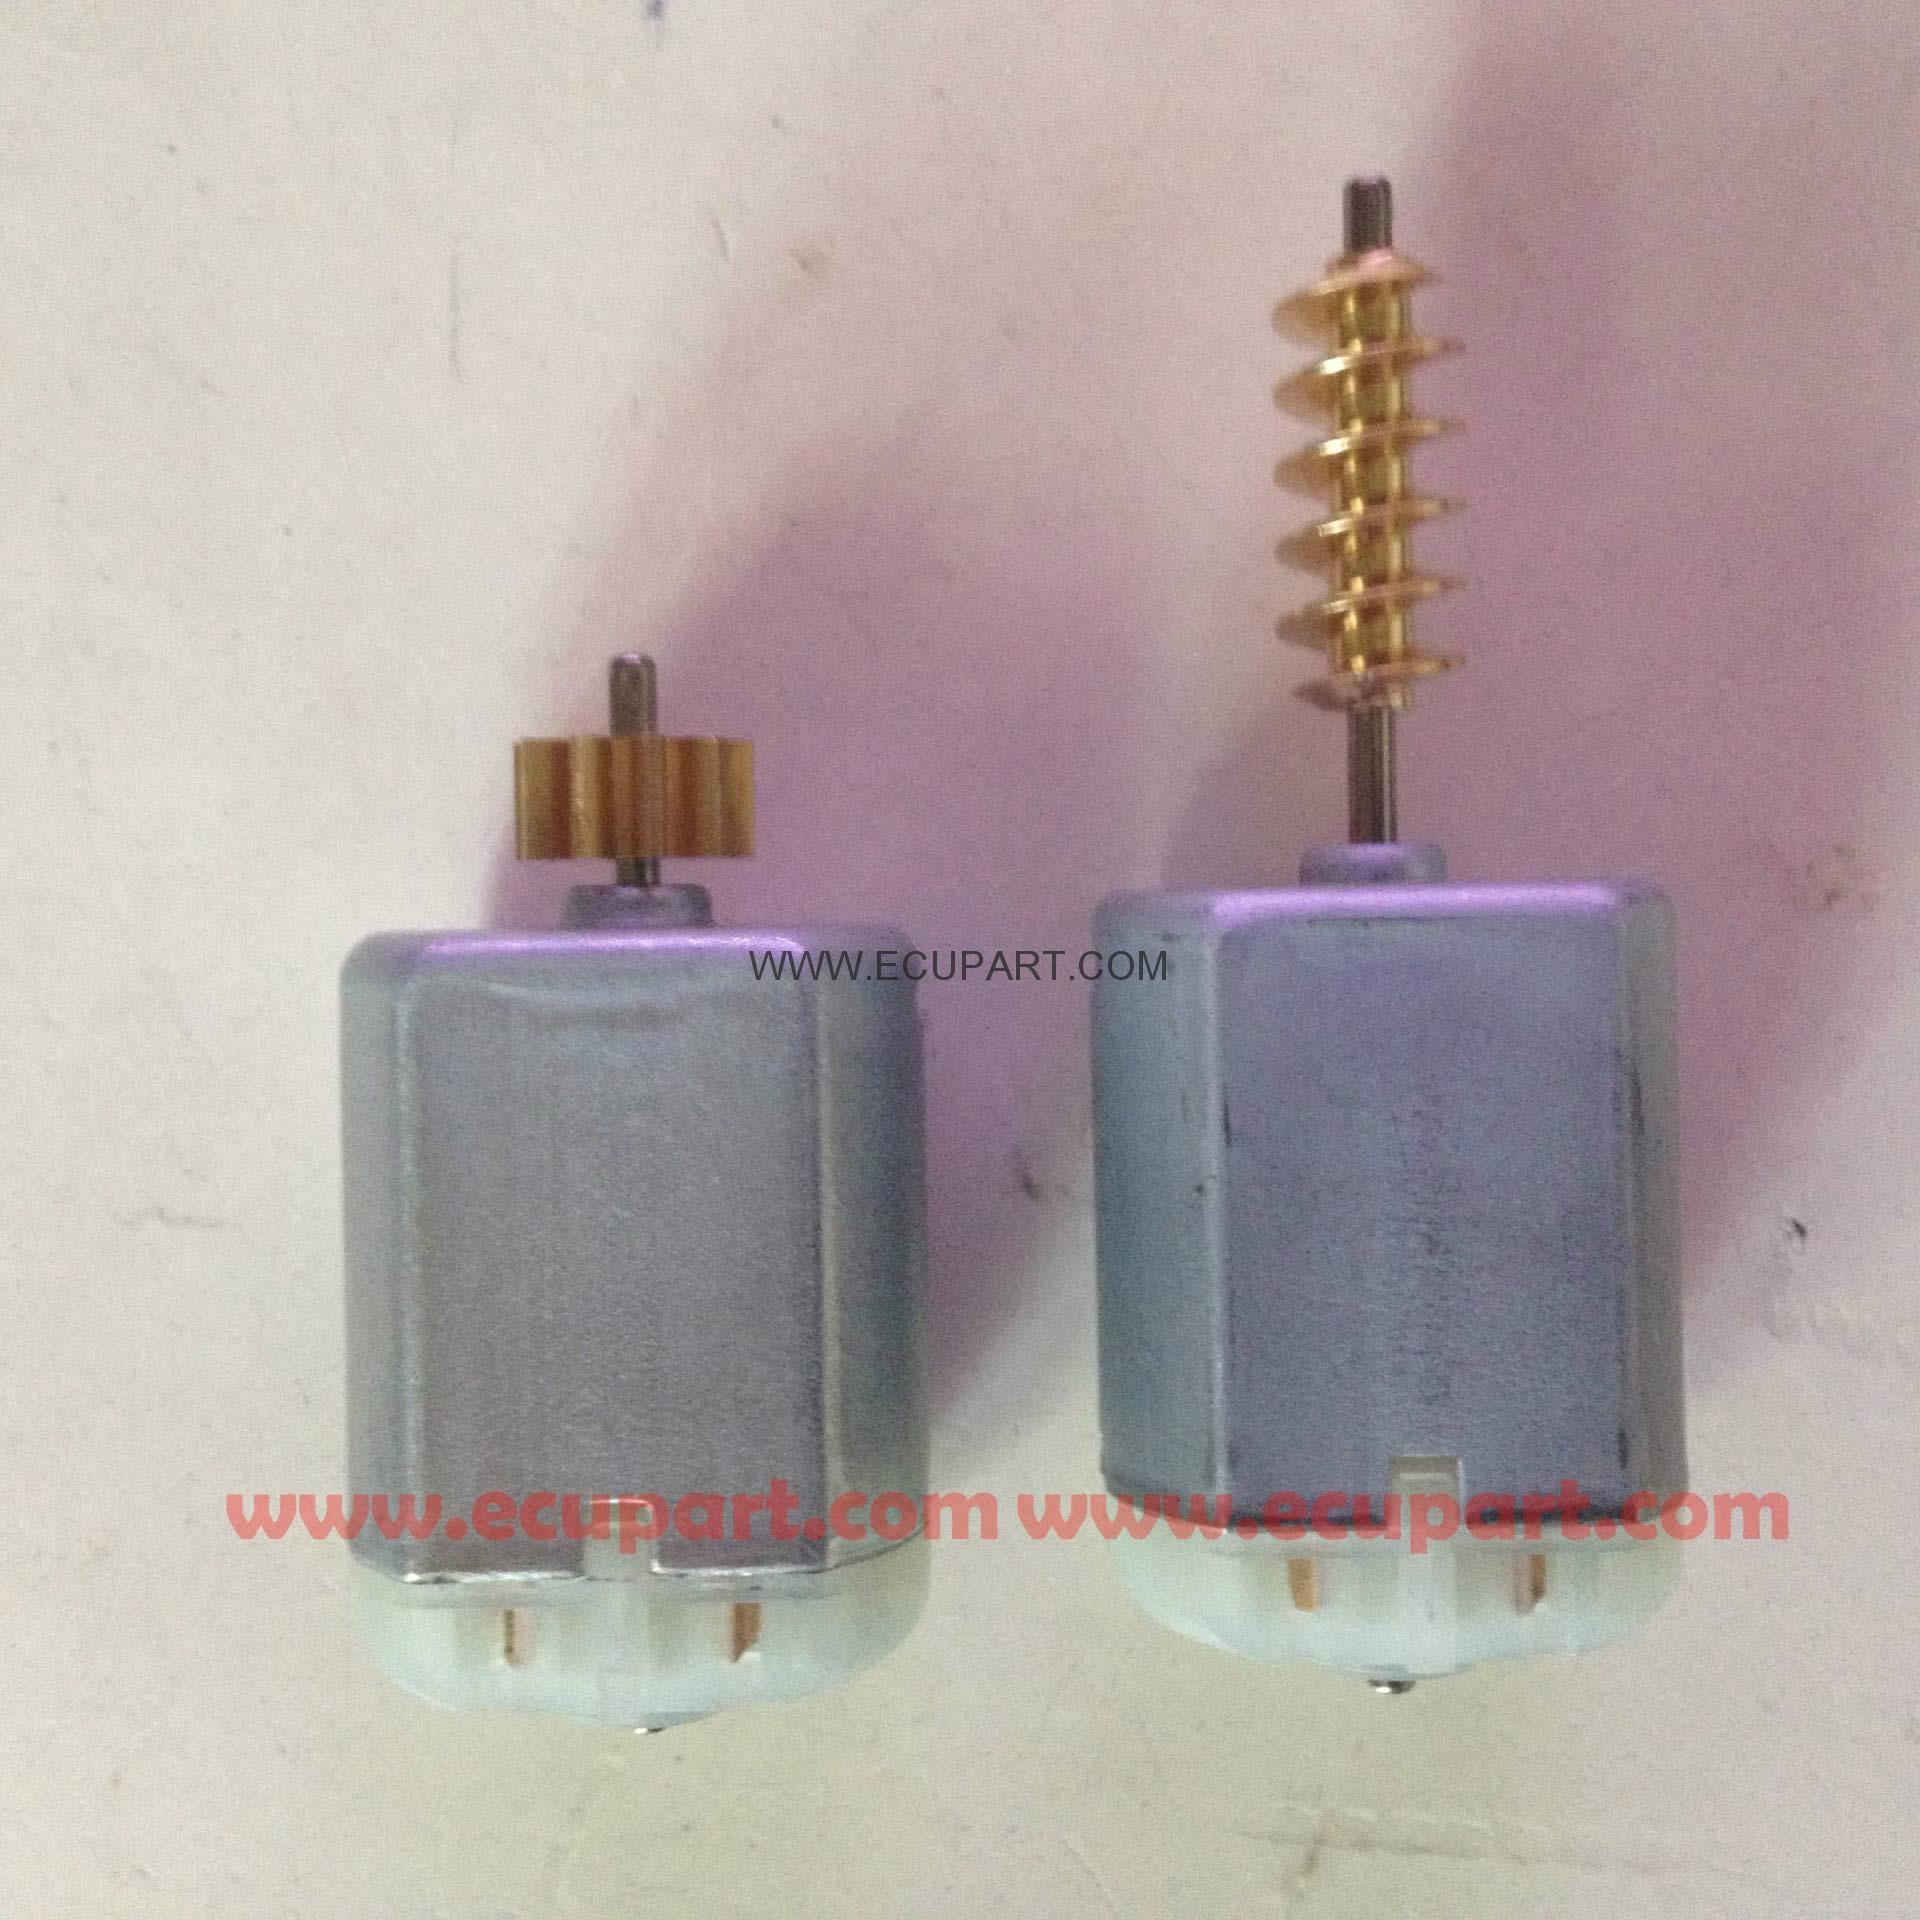 奔馳R280 R300 R350 R500 R630後備箱鎖馬達 後備箱鎖電機 1